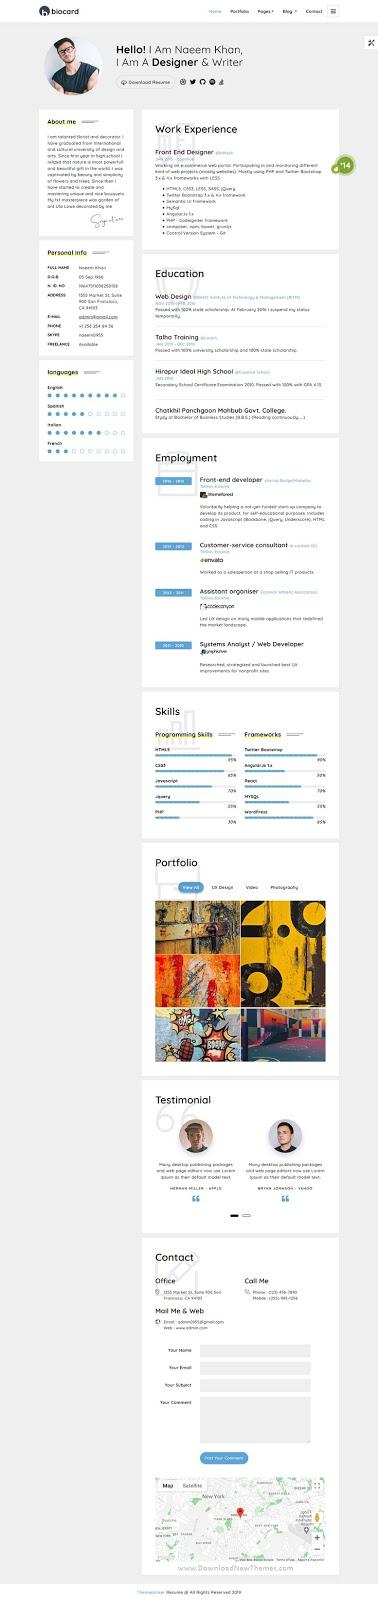 Biocard - Personal / CV / Resume & vCard Template